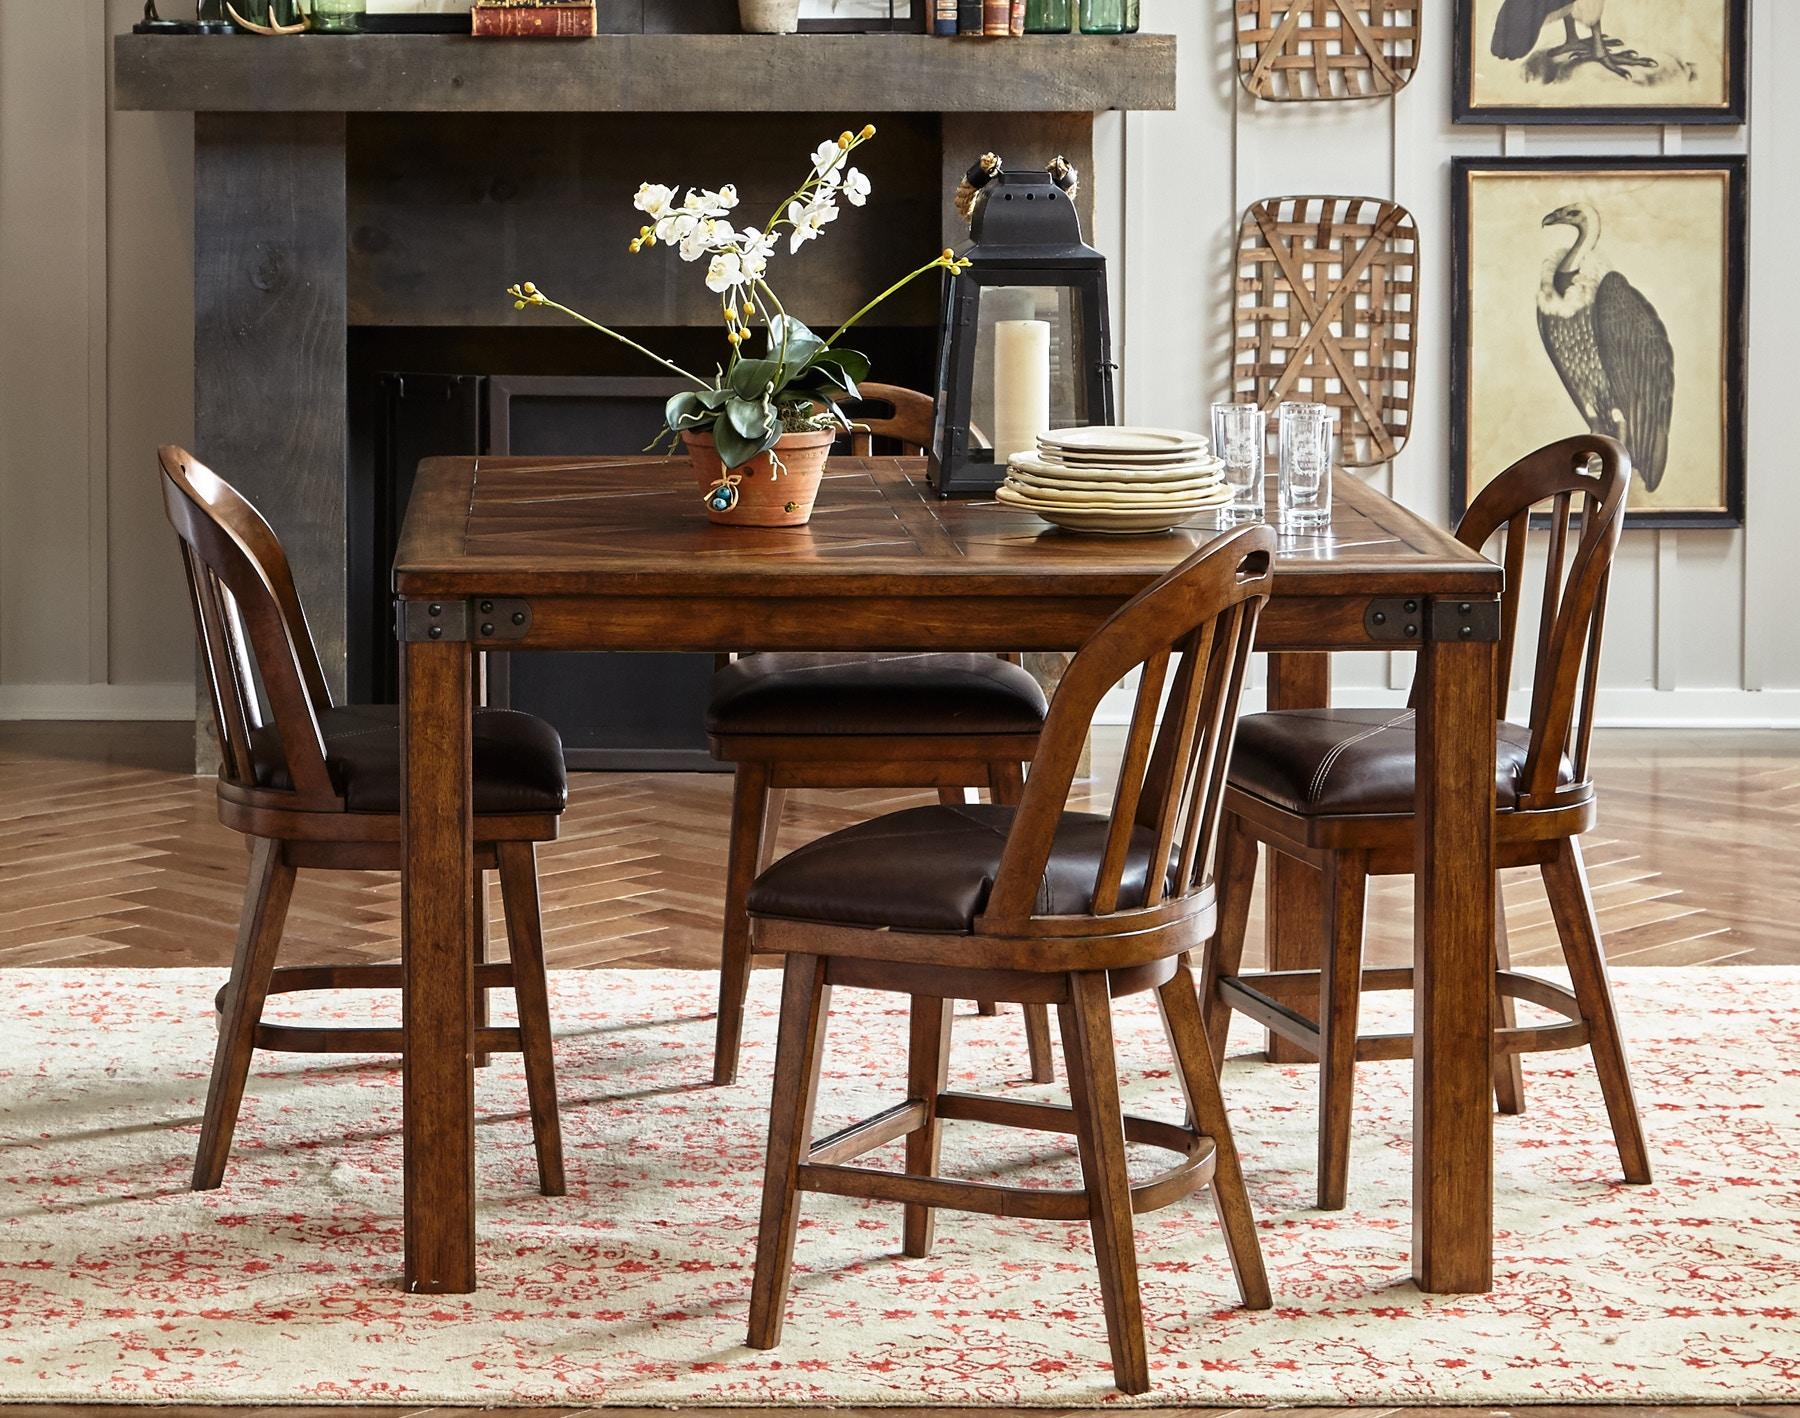 Pulaski Furniture Heartland Falls Windsor Gathering Dining Set 486378